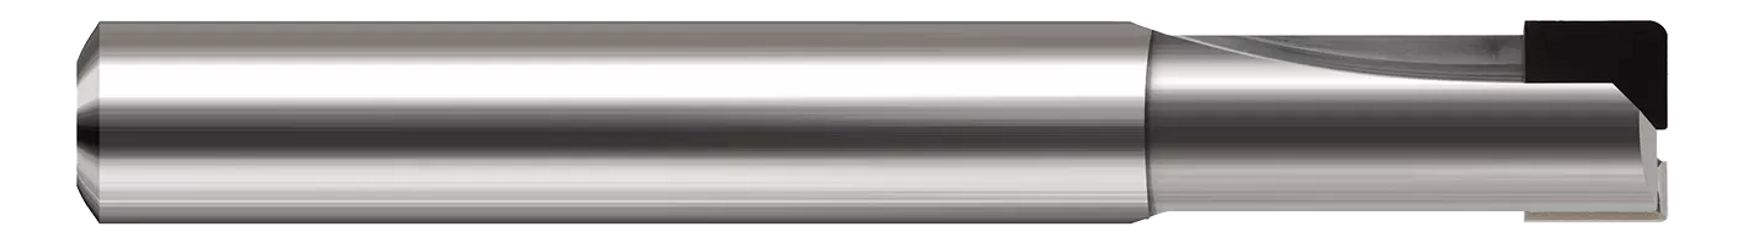 Diamond End Mills for Non-Ferrous Materials - PCD Diamond - Corner Radius